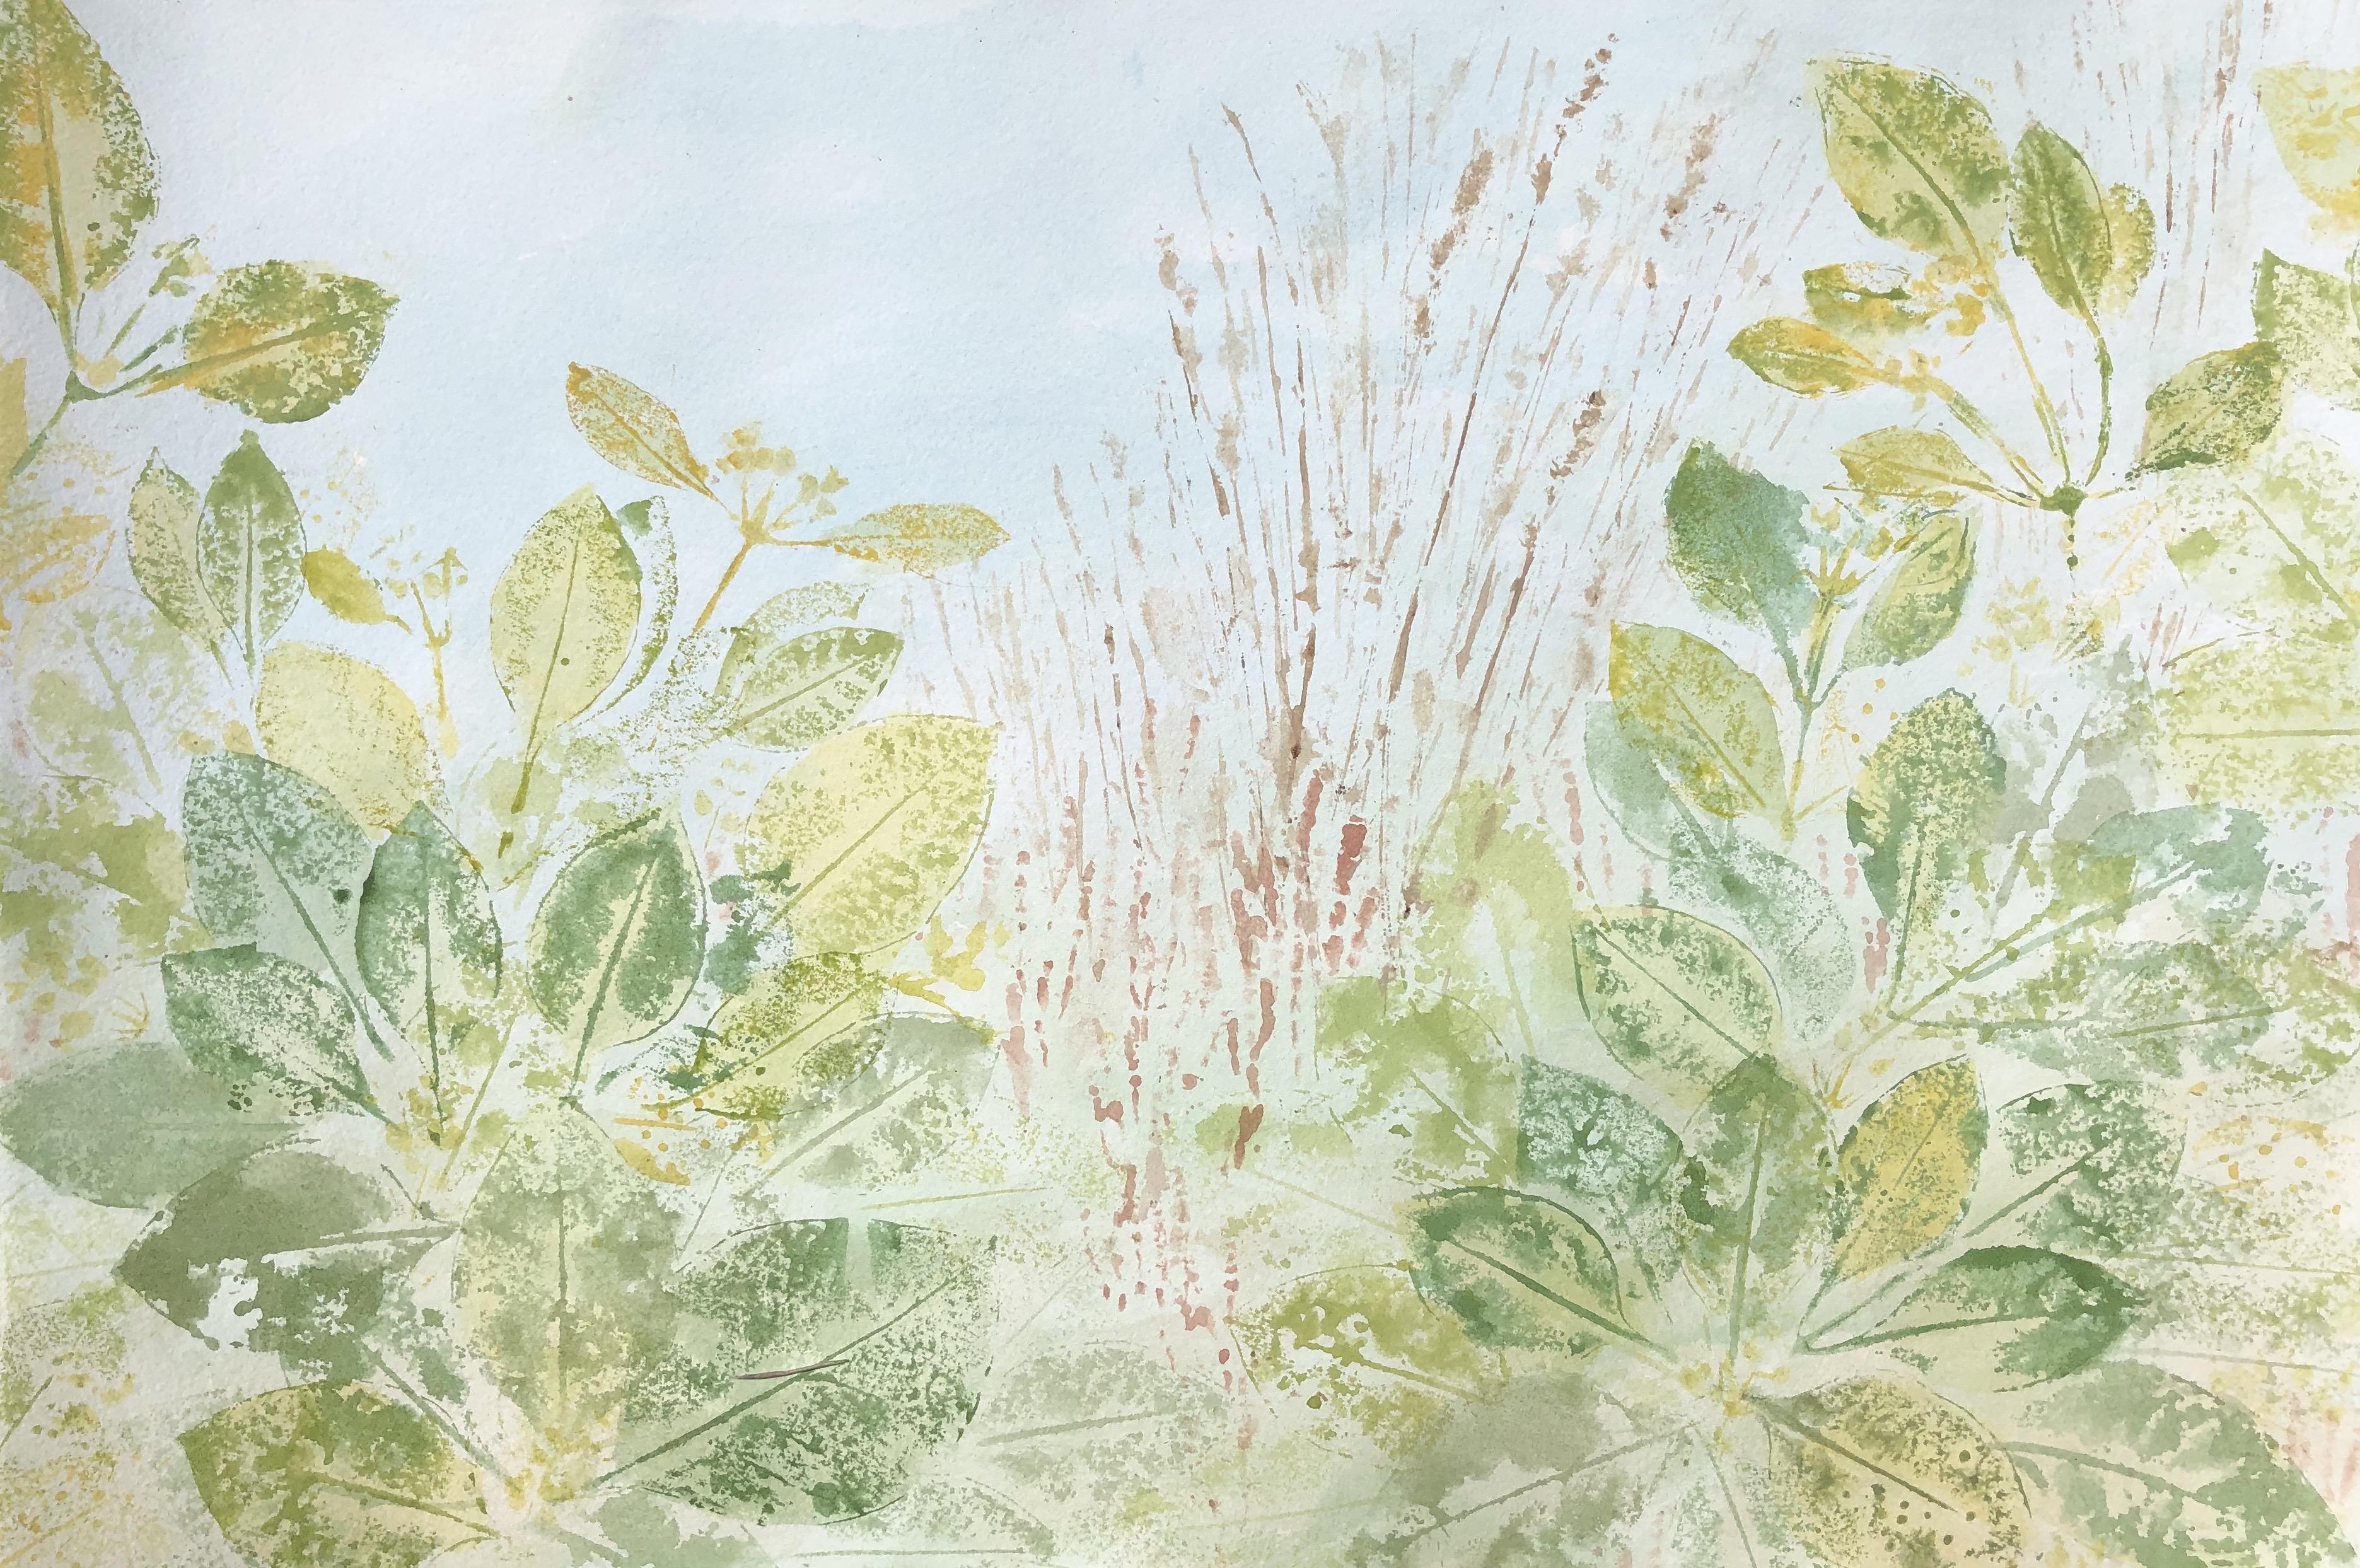 Mangroves, Samphire and Reeds